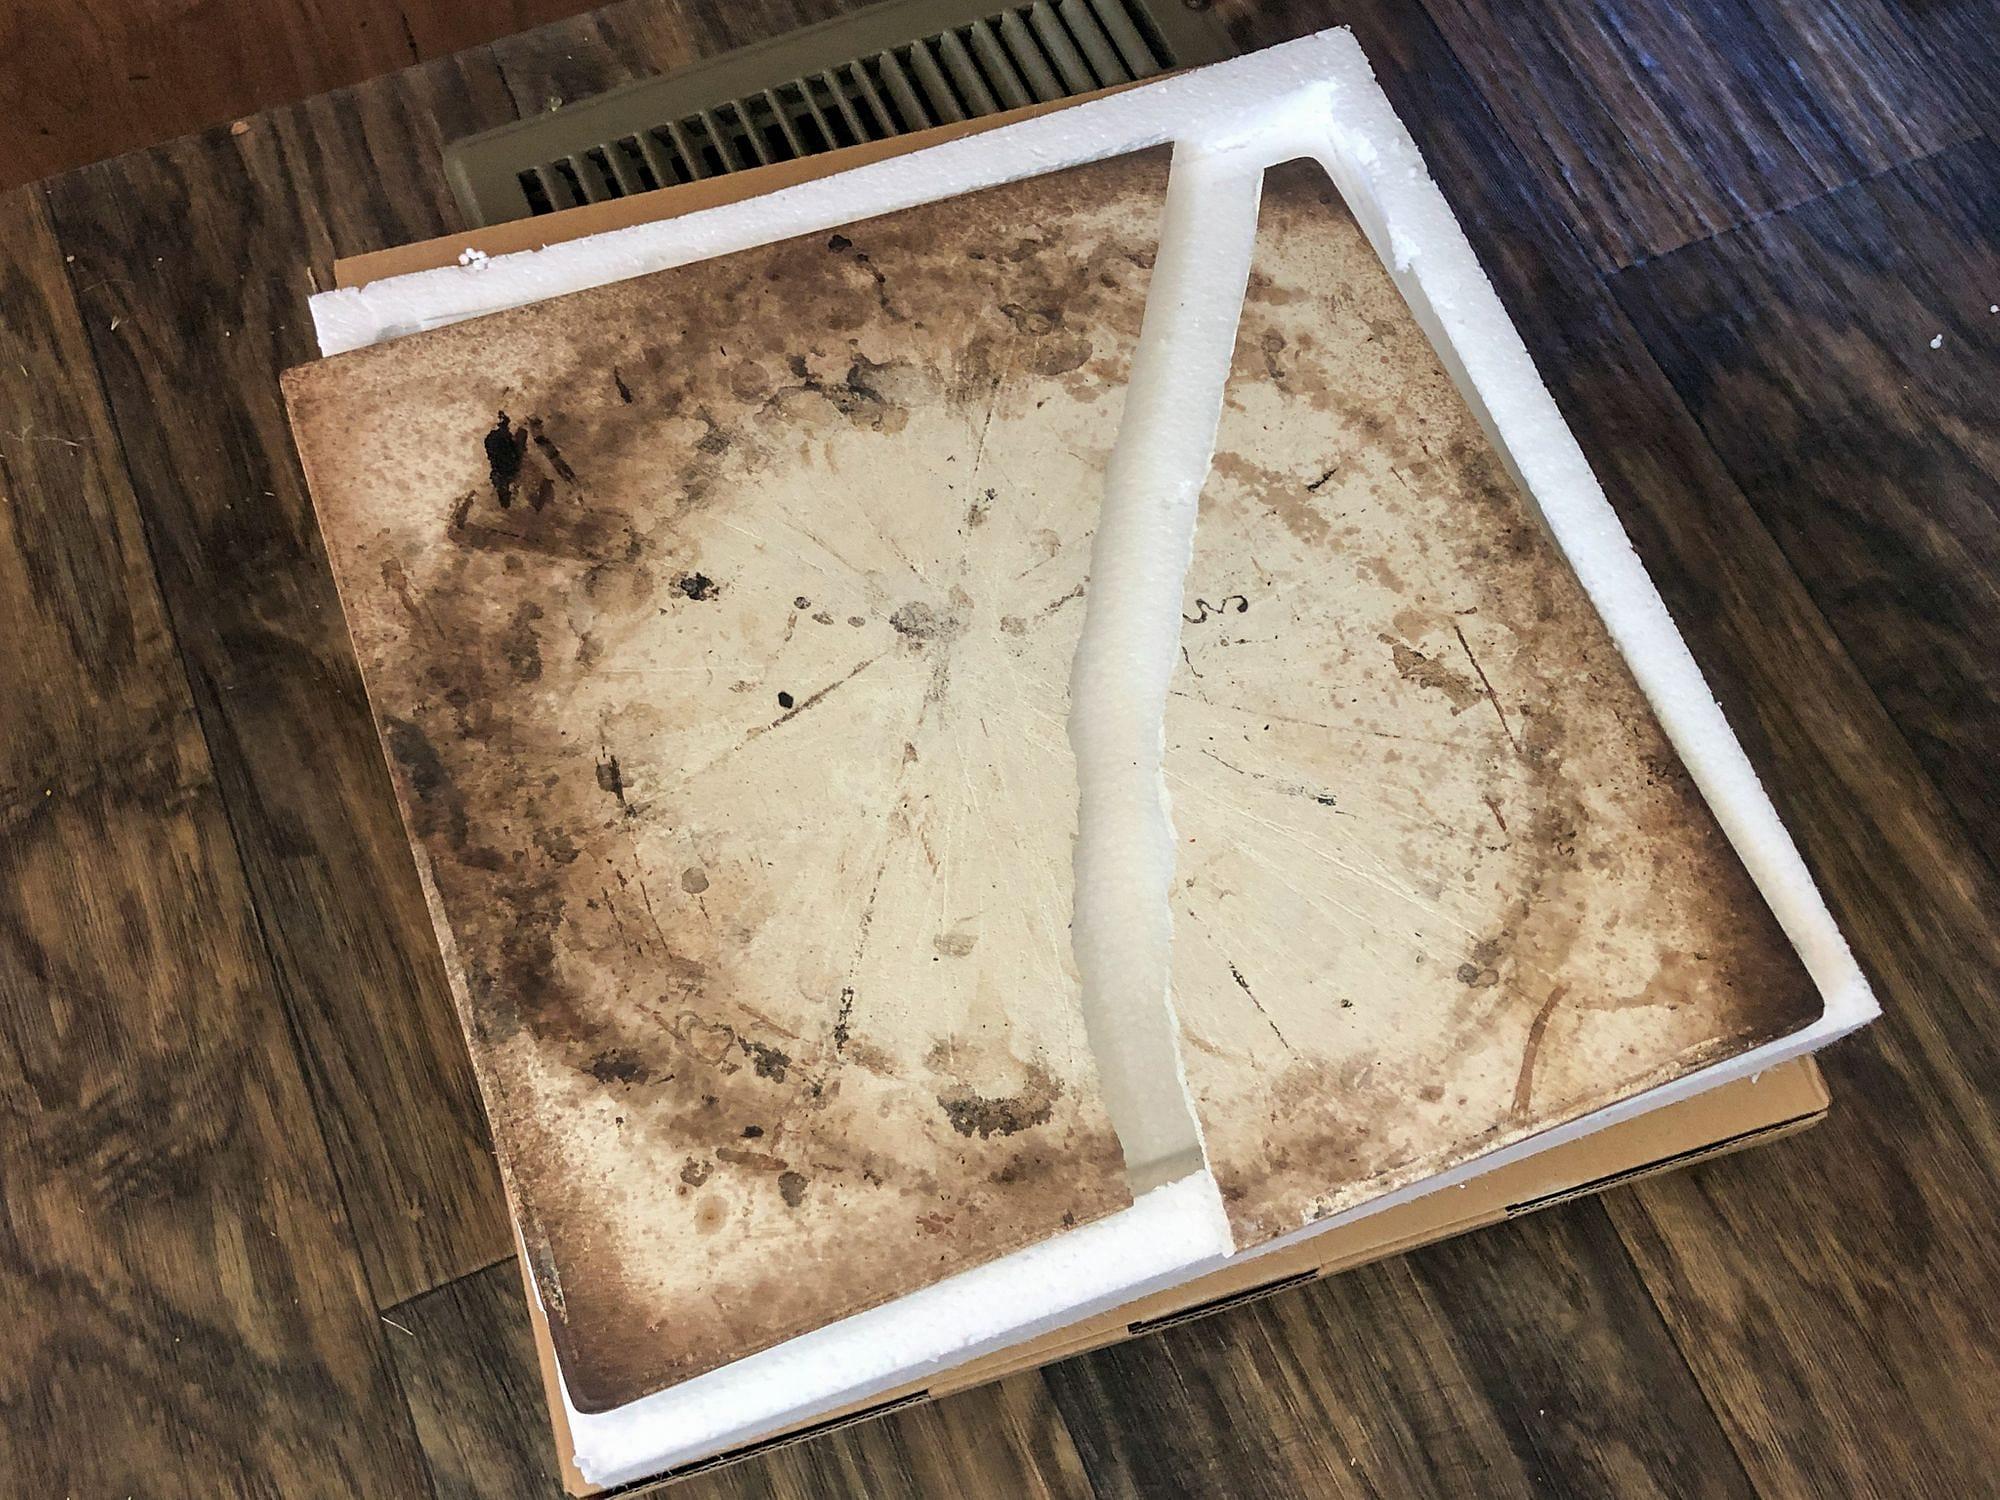 Broken Pizza Stone